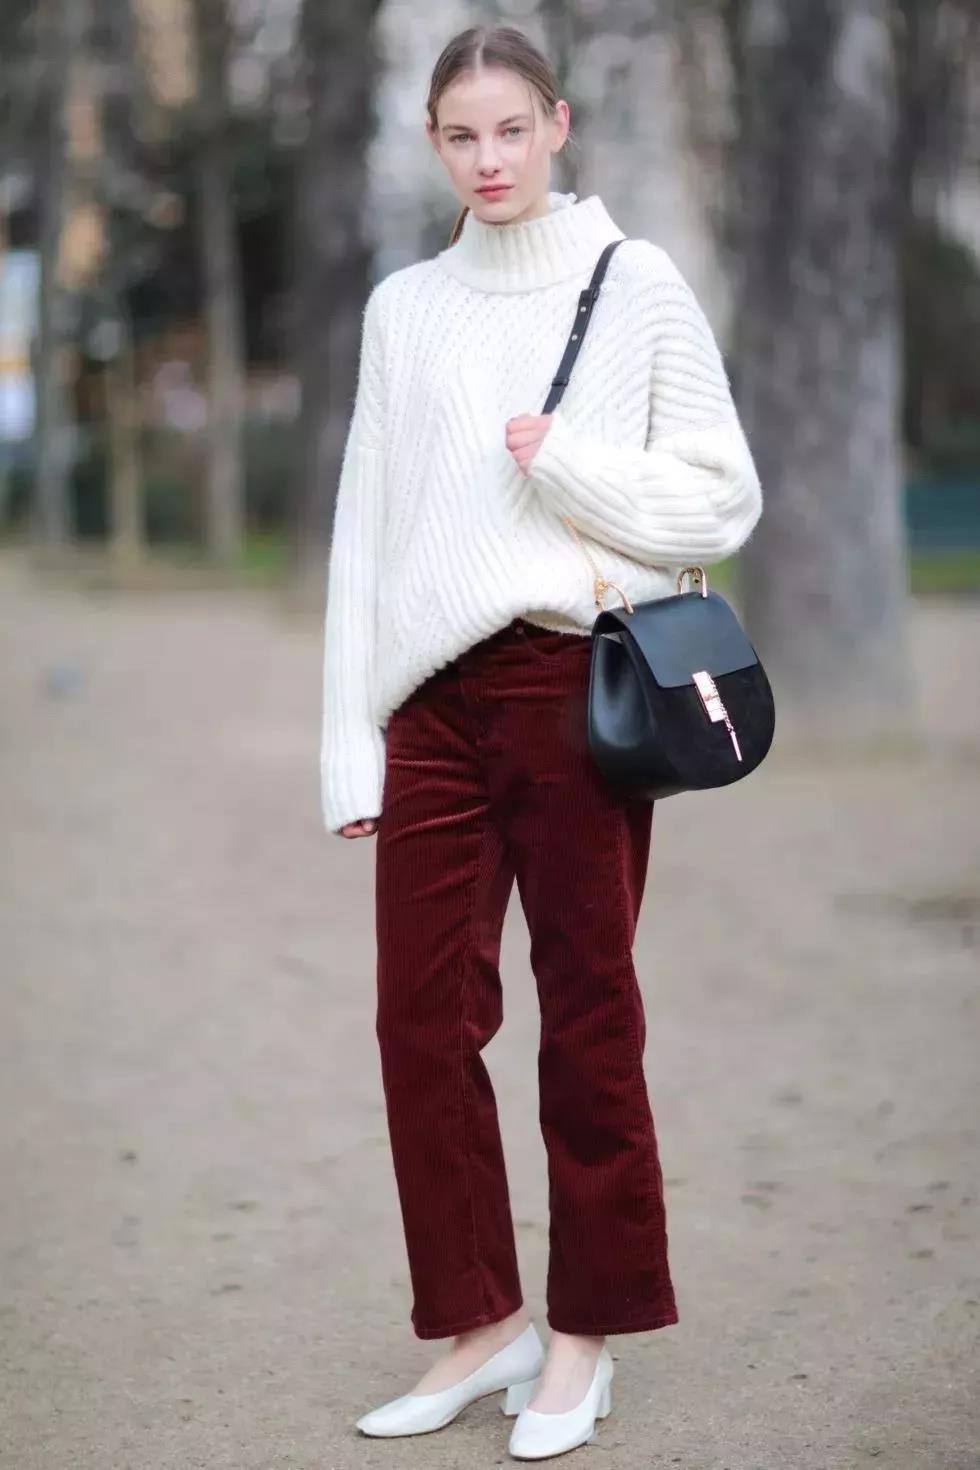 Eye-catching burgundy winter pants